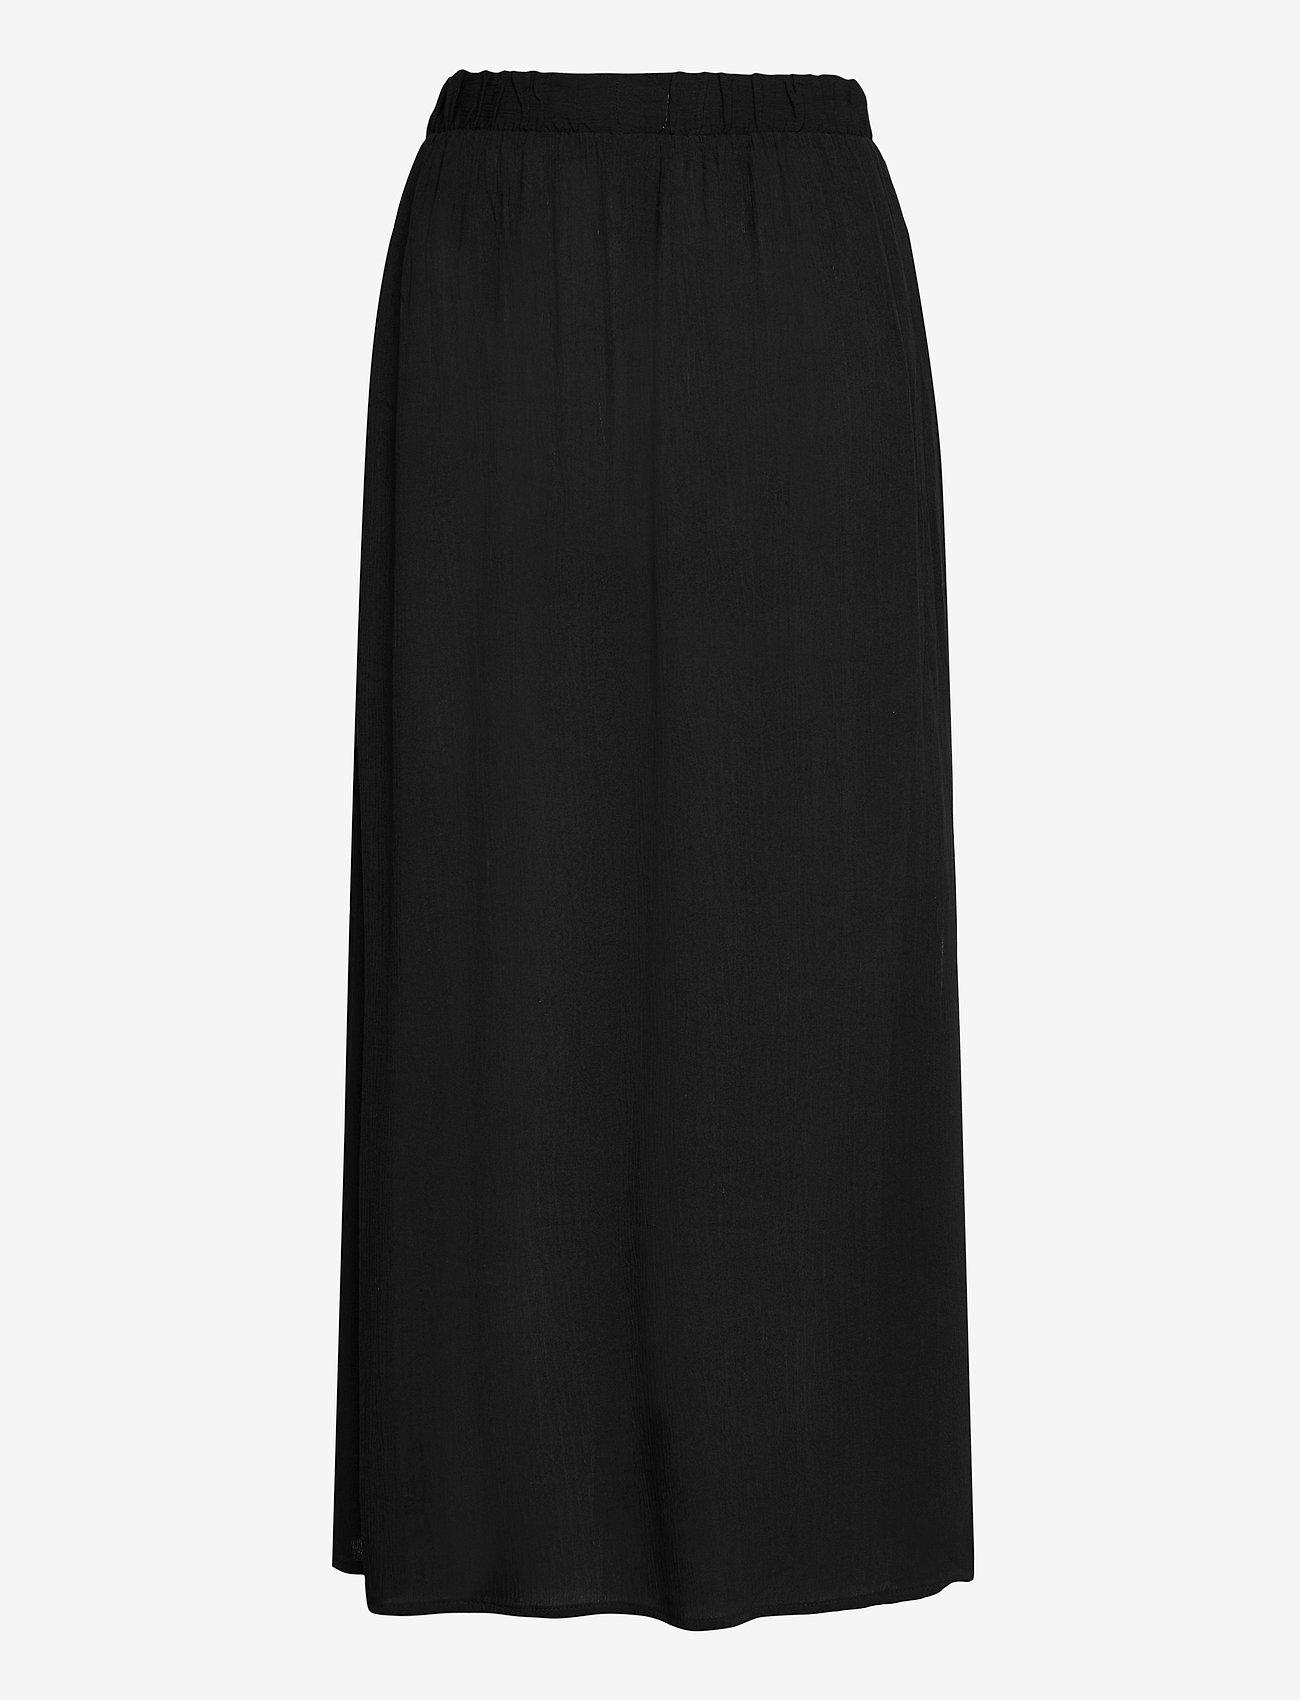 ICHI - IHMARRAKECH SO SK3 - midi skirts - black - 1